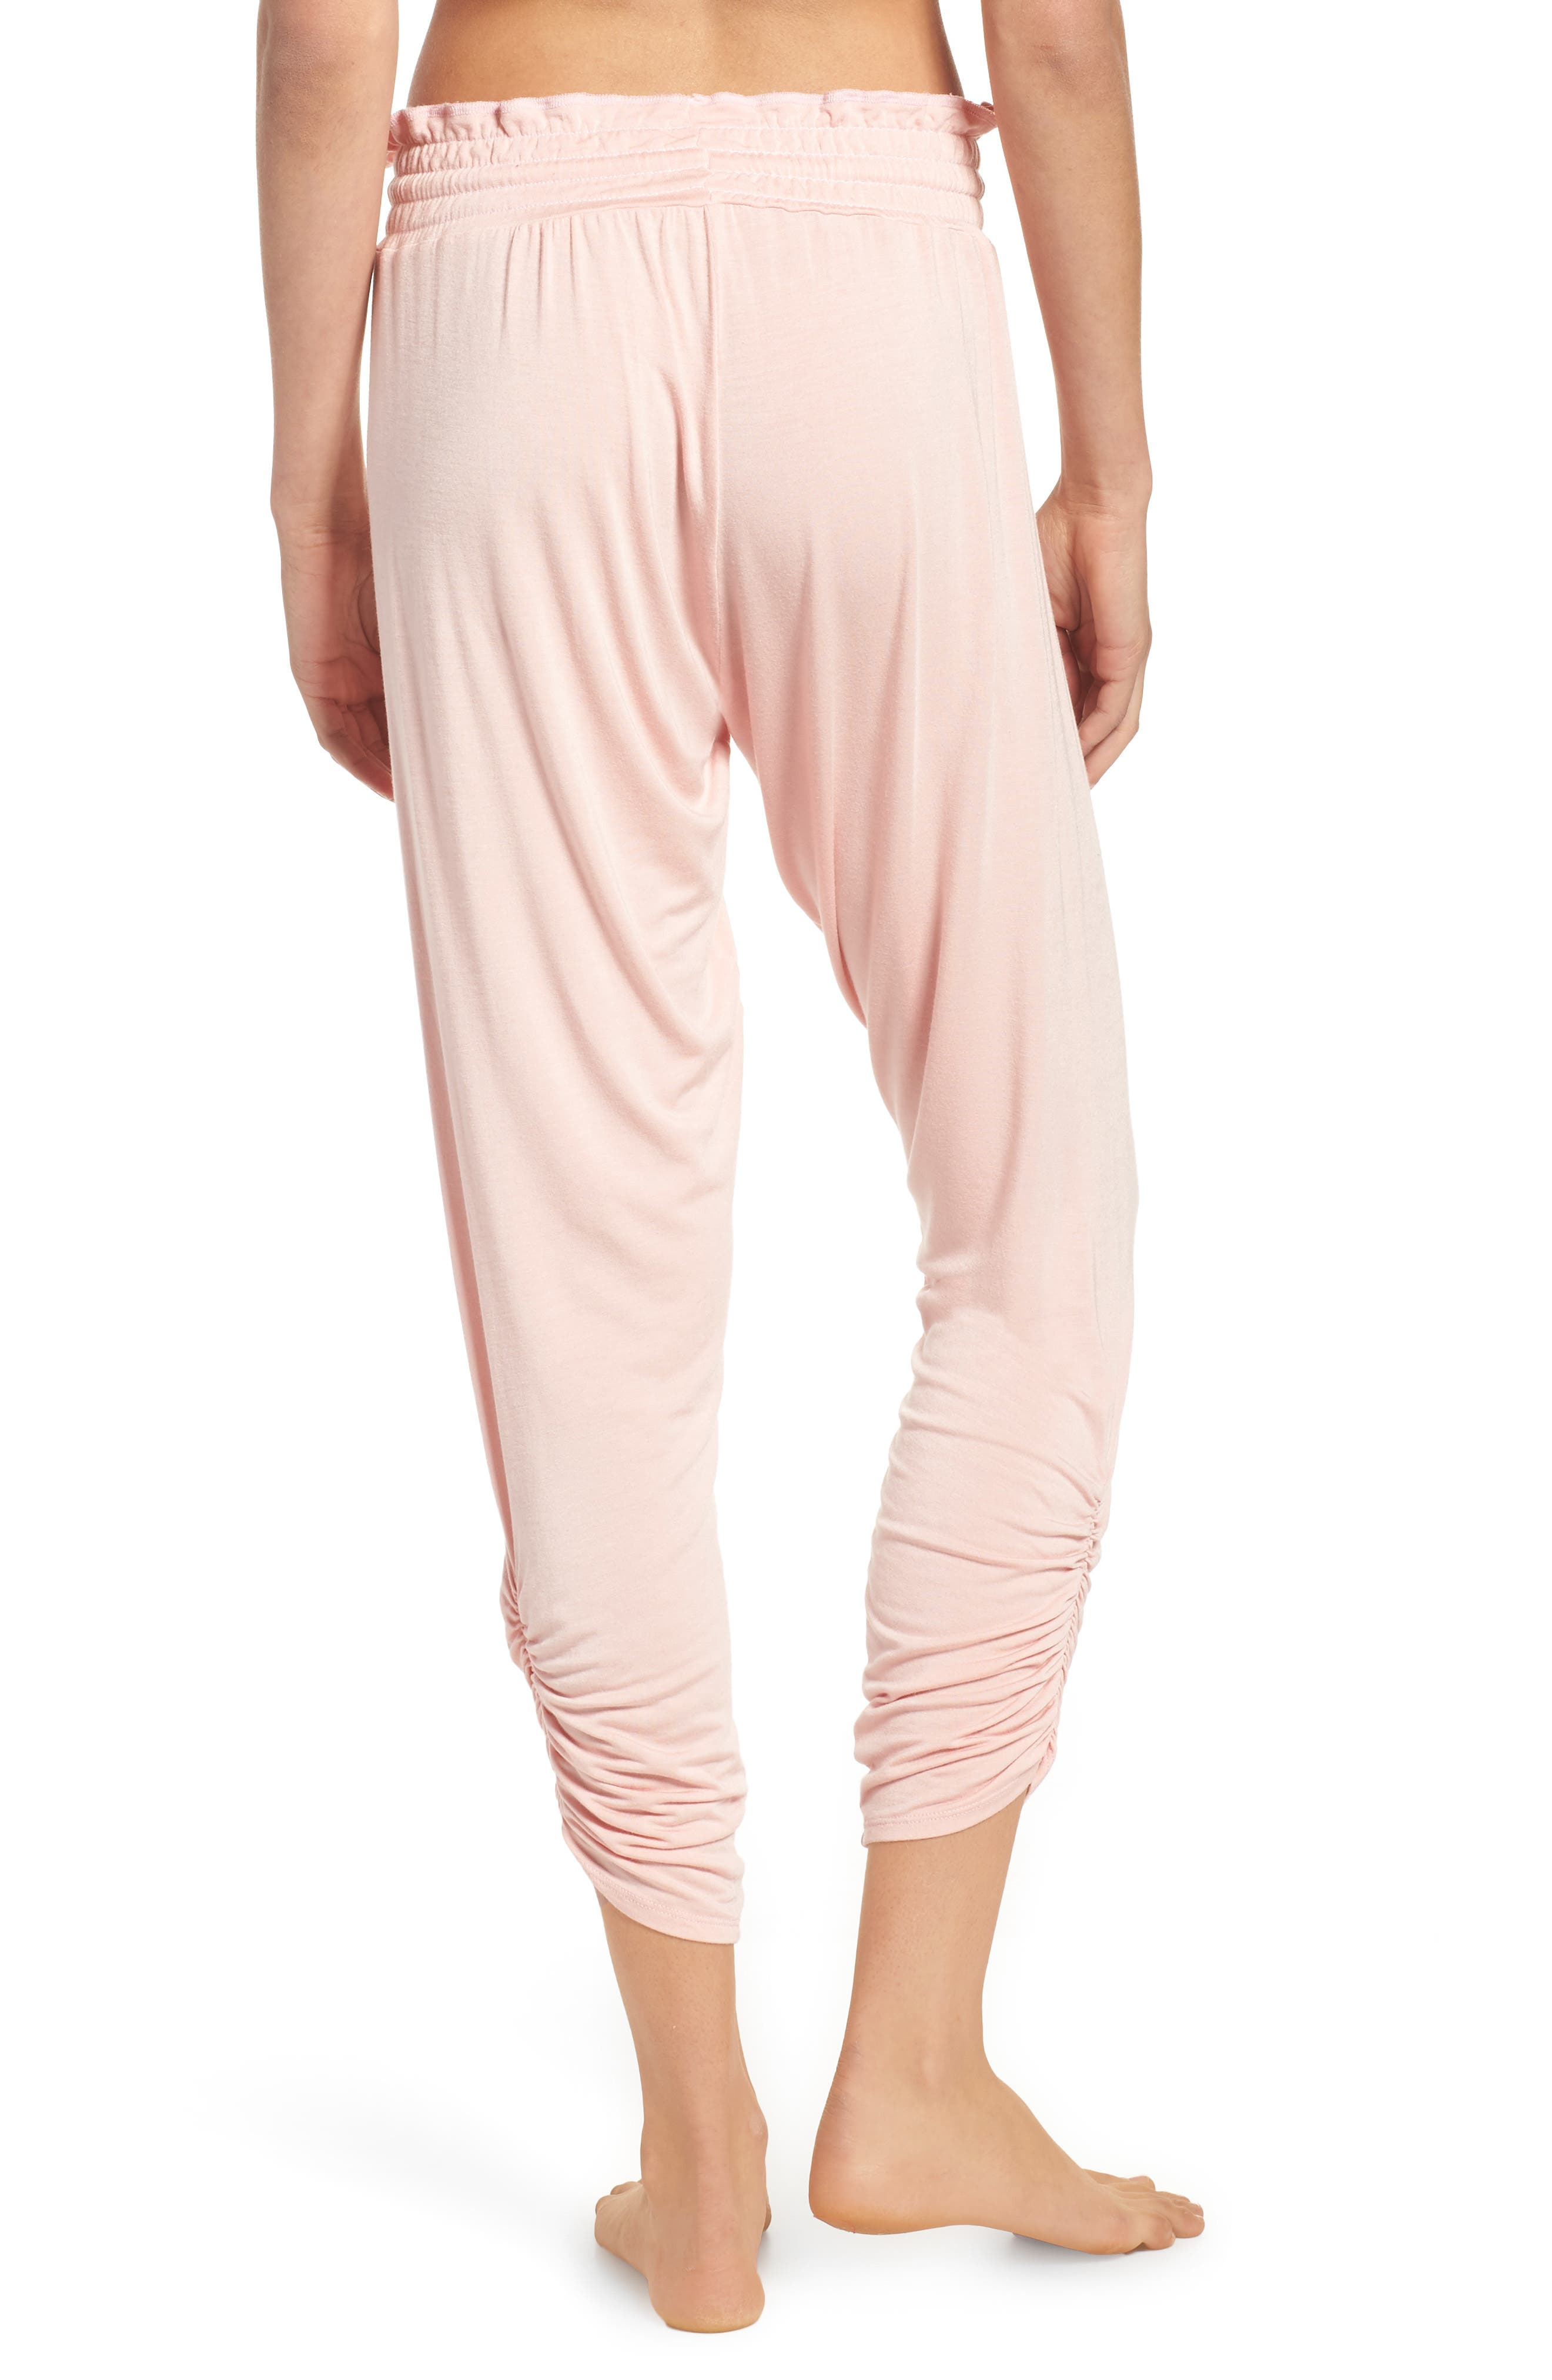 Bella Pants,                             Alternate thumbnail 2, color,                             Dream Pink